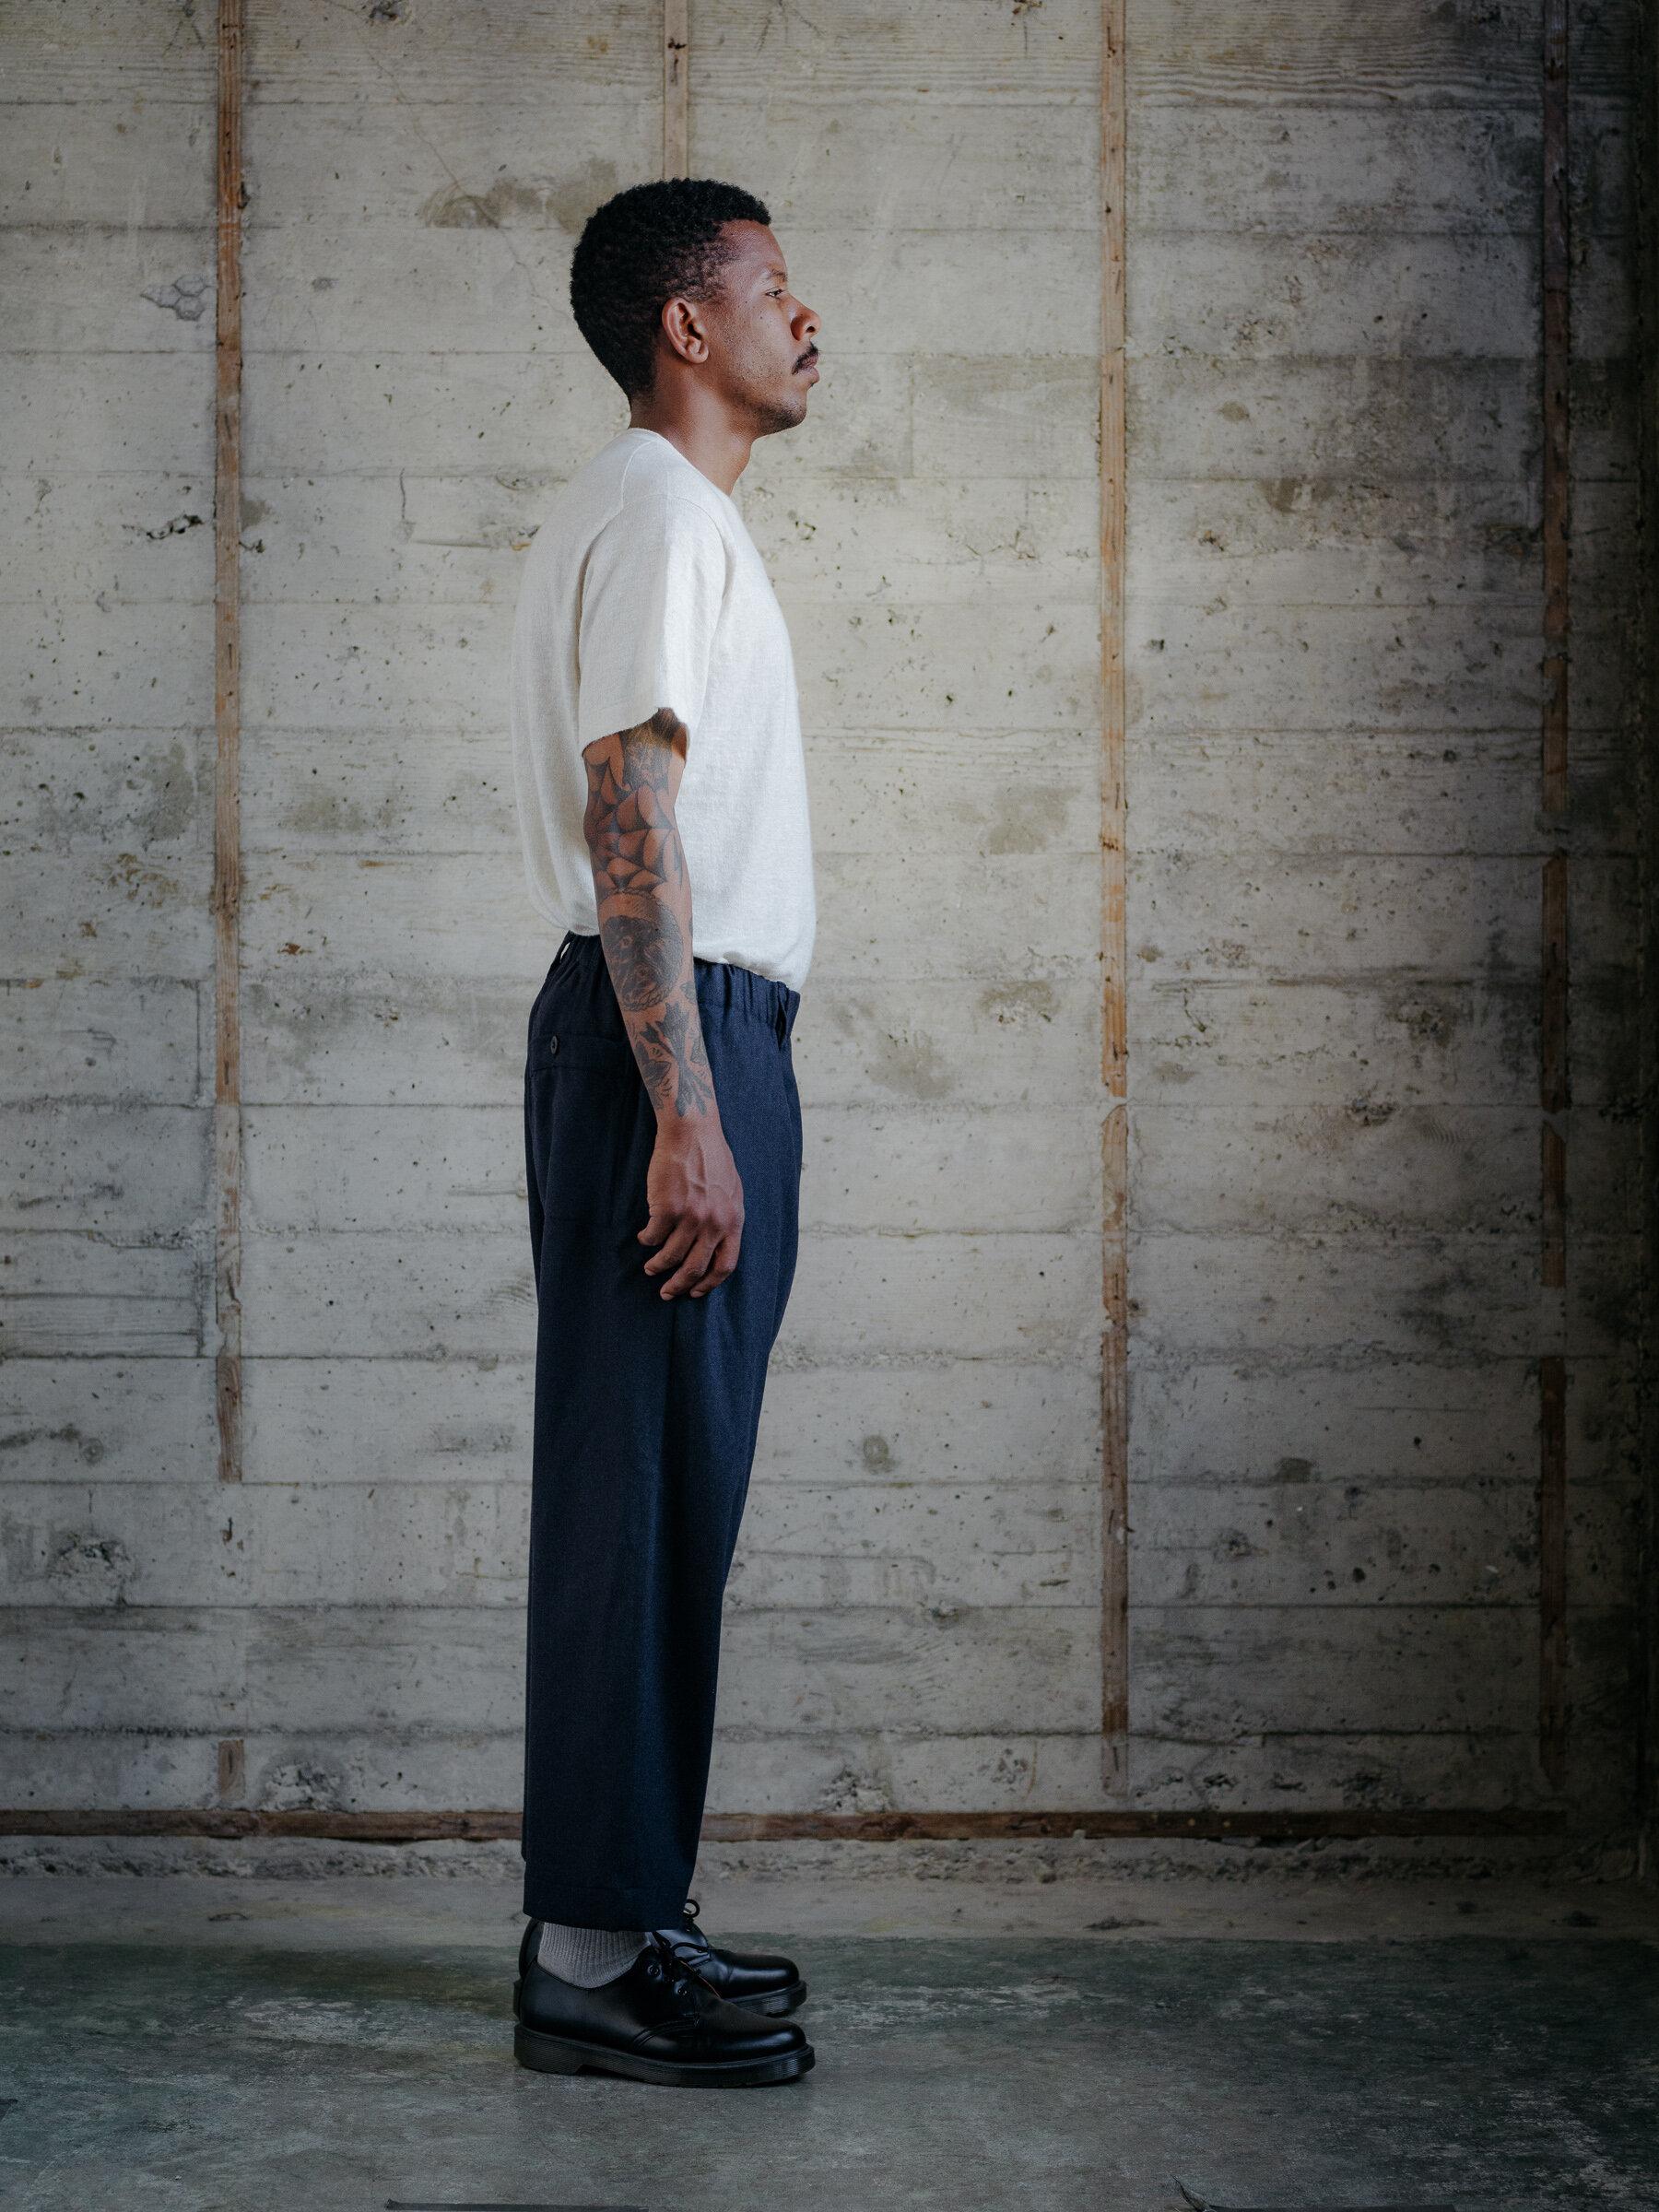 evan-kinori-elastic-pant-cashmere-lambswool-woven-in-england-made-in-san-francisco-2